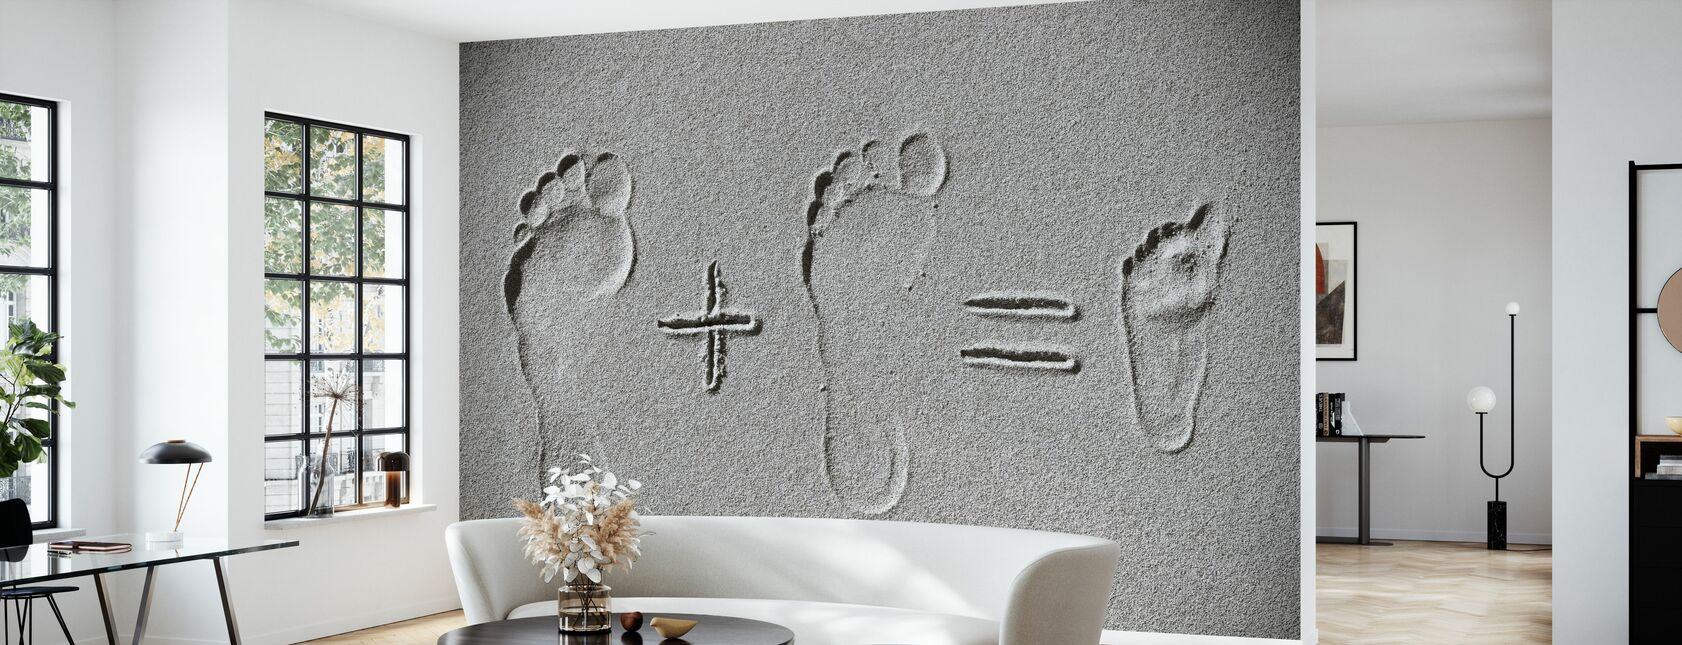 Sand Arithmetic - Wallpaper - Living Room